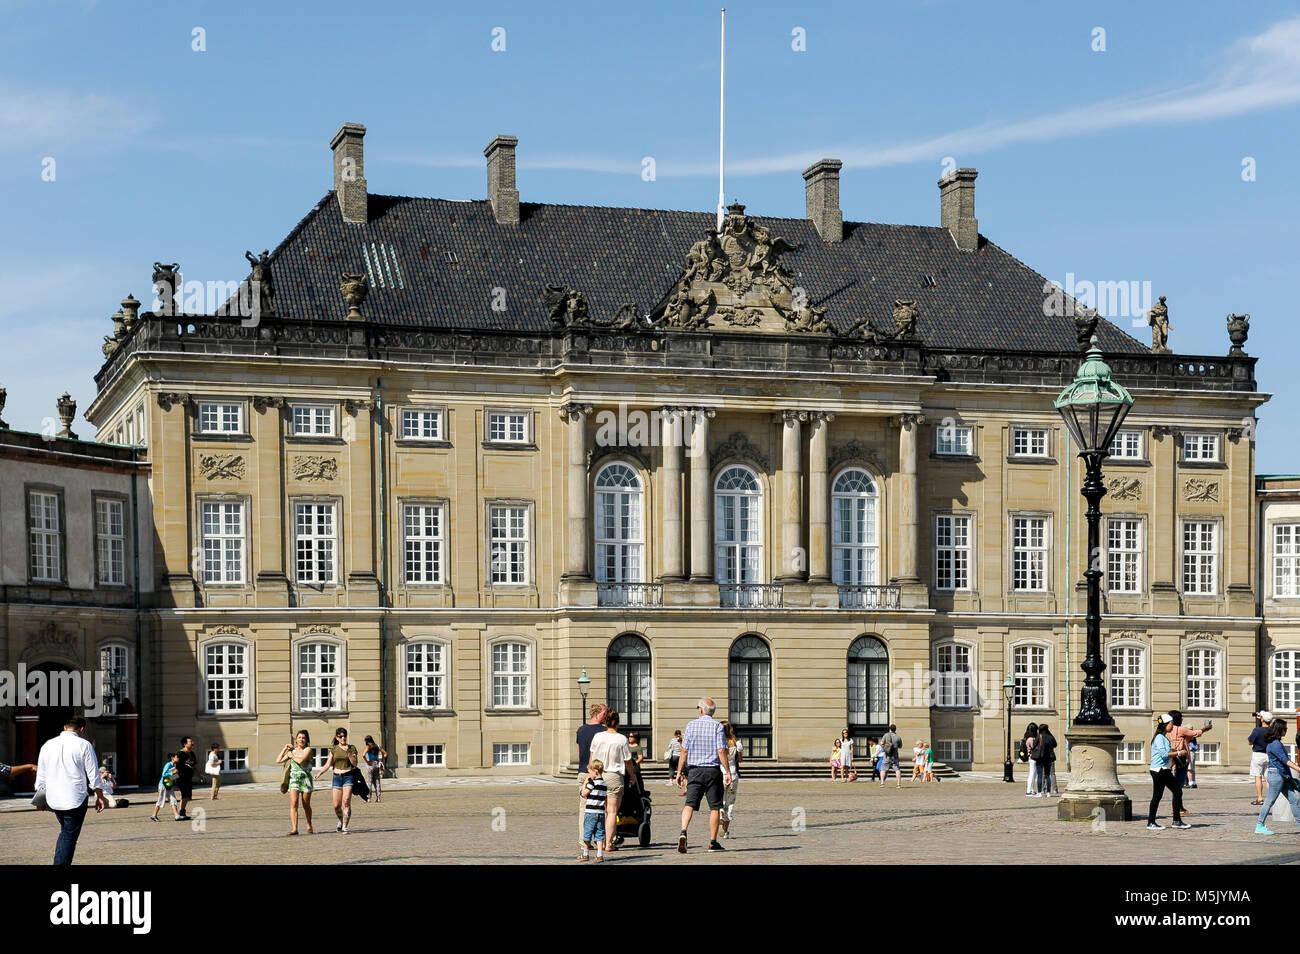 Rococo Christian VIII's Palae or Levetzaus Palae (Christian VIII's Palace or Levetzau's Palace) of Amalienborg Palace, Stock Photo